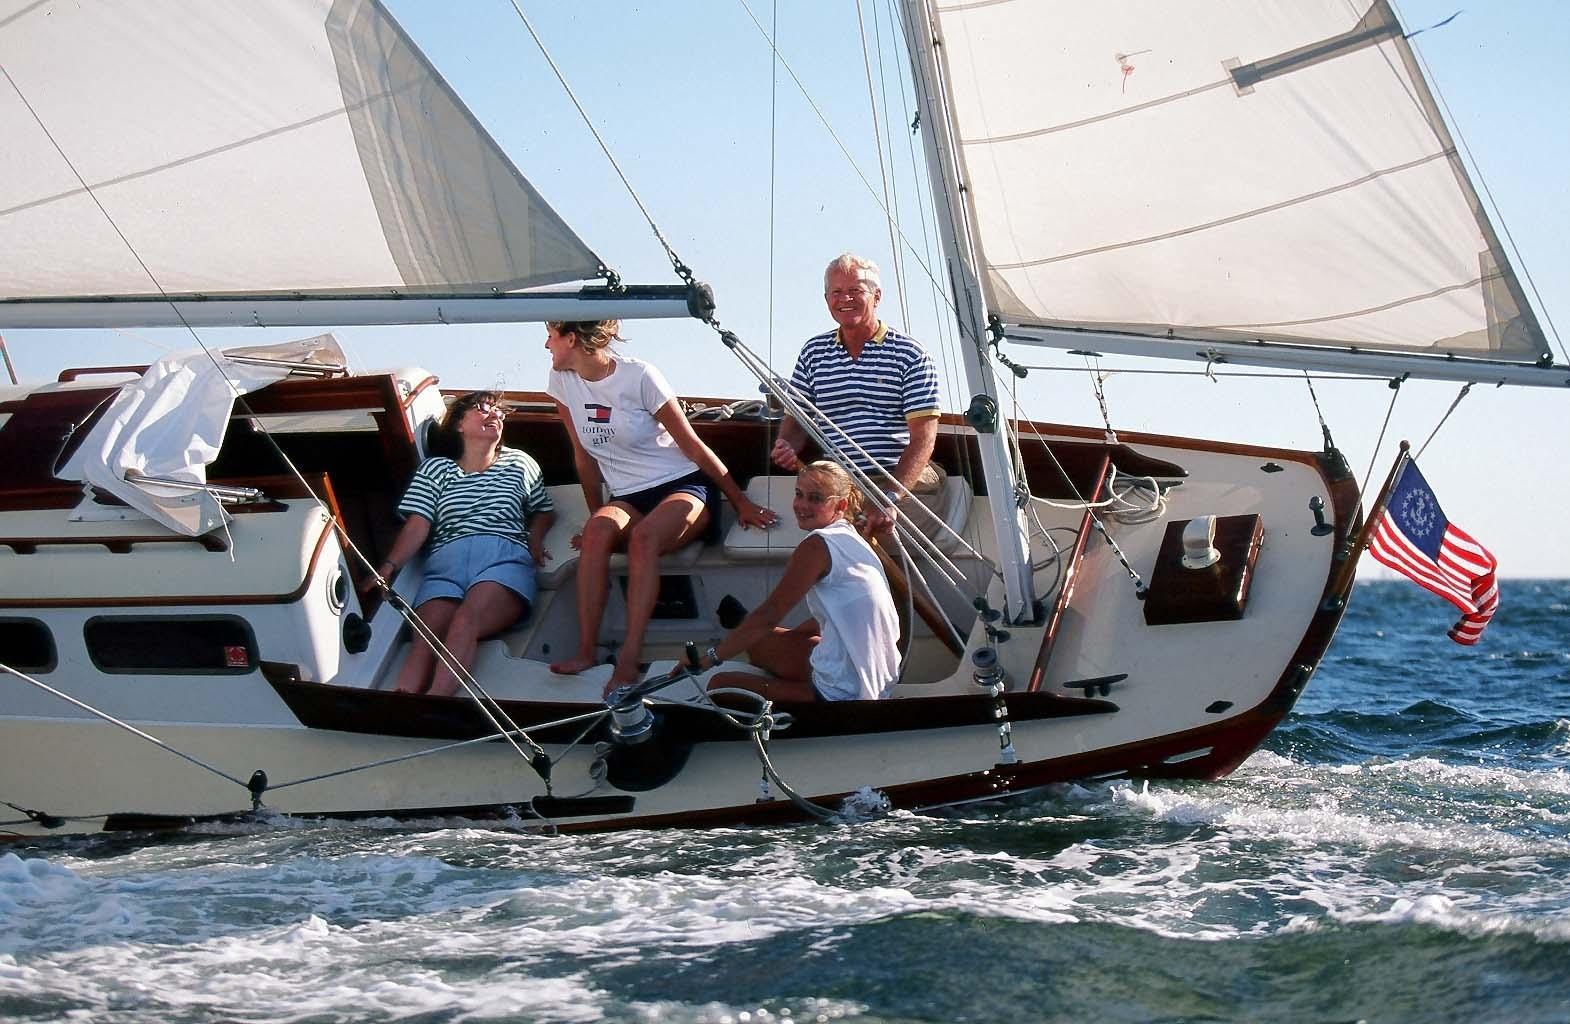 1954 LUKENIELSEN Yawl Sail Boat For Sale Wwwyachtworldcom